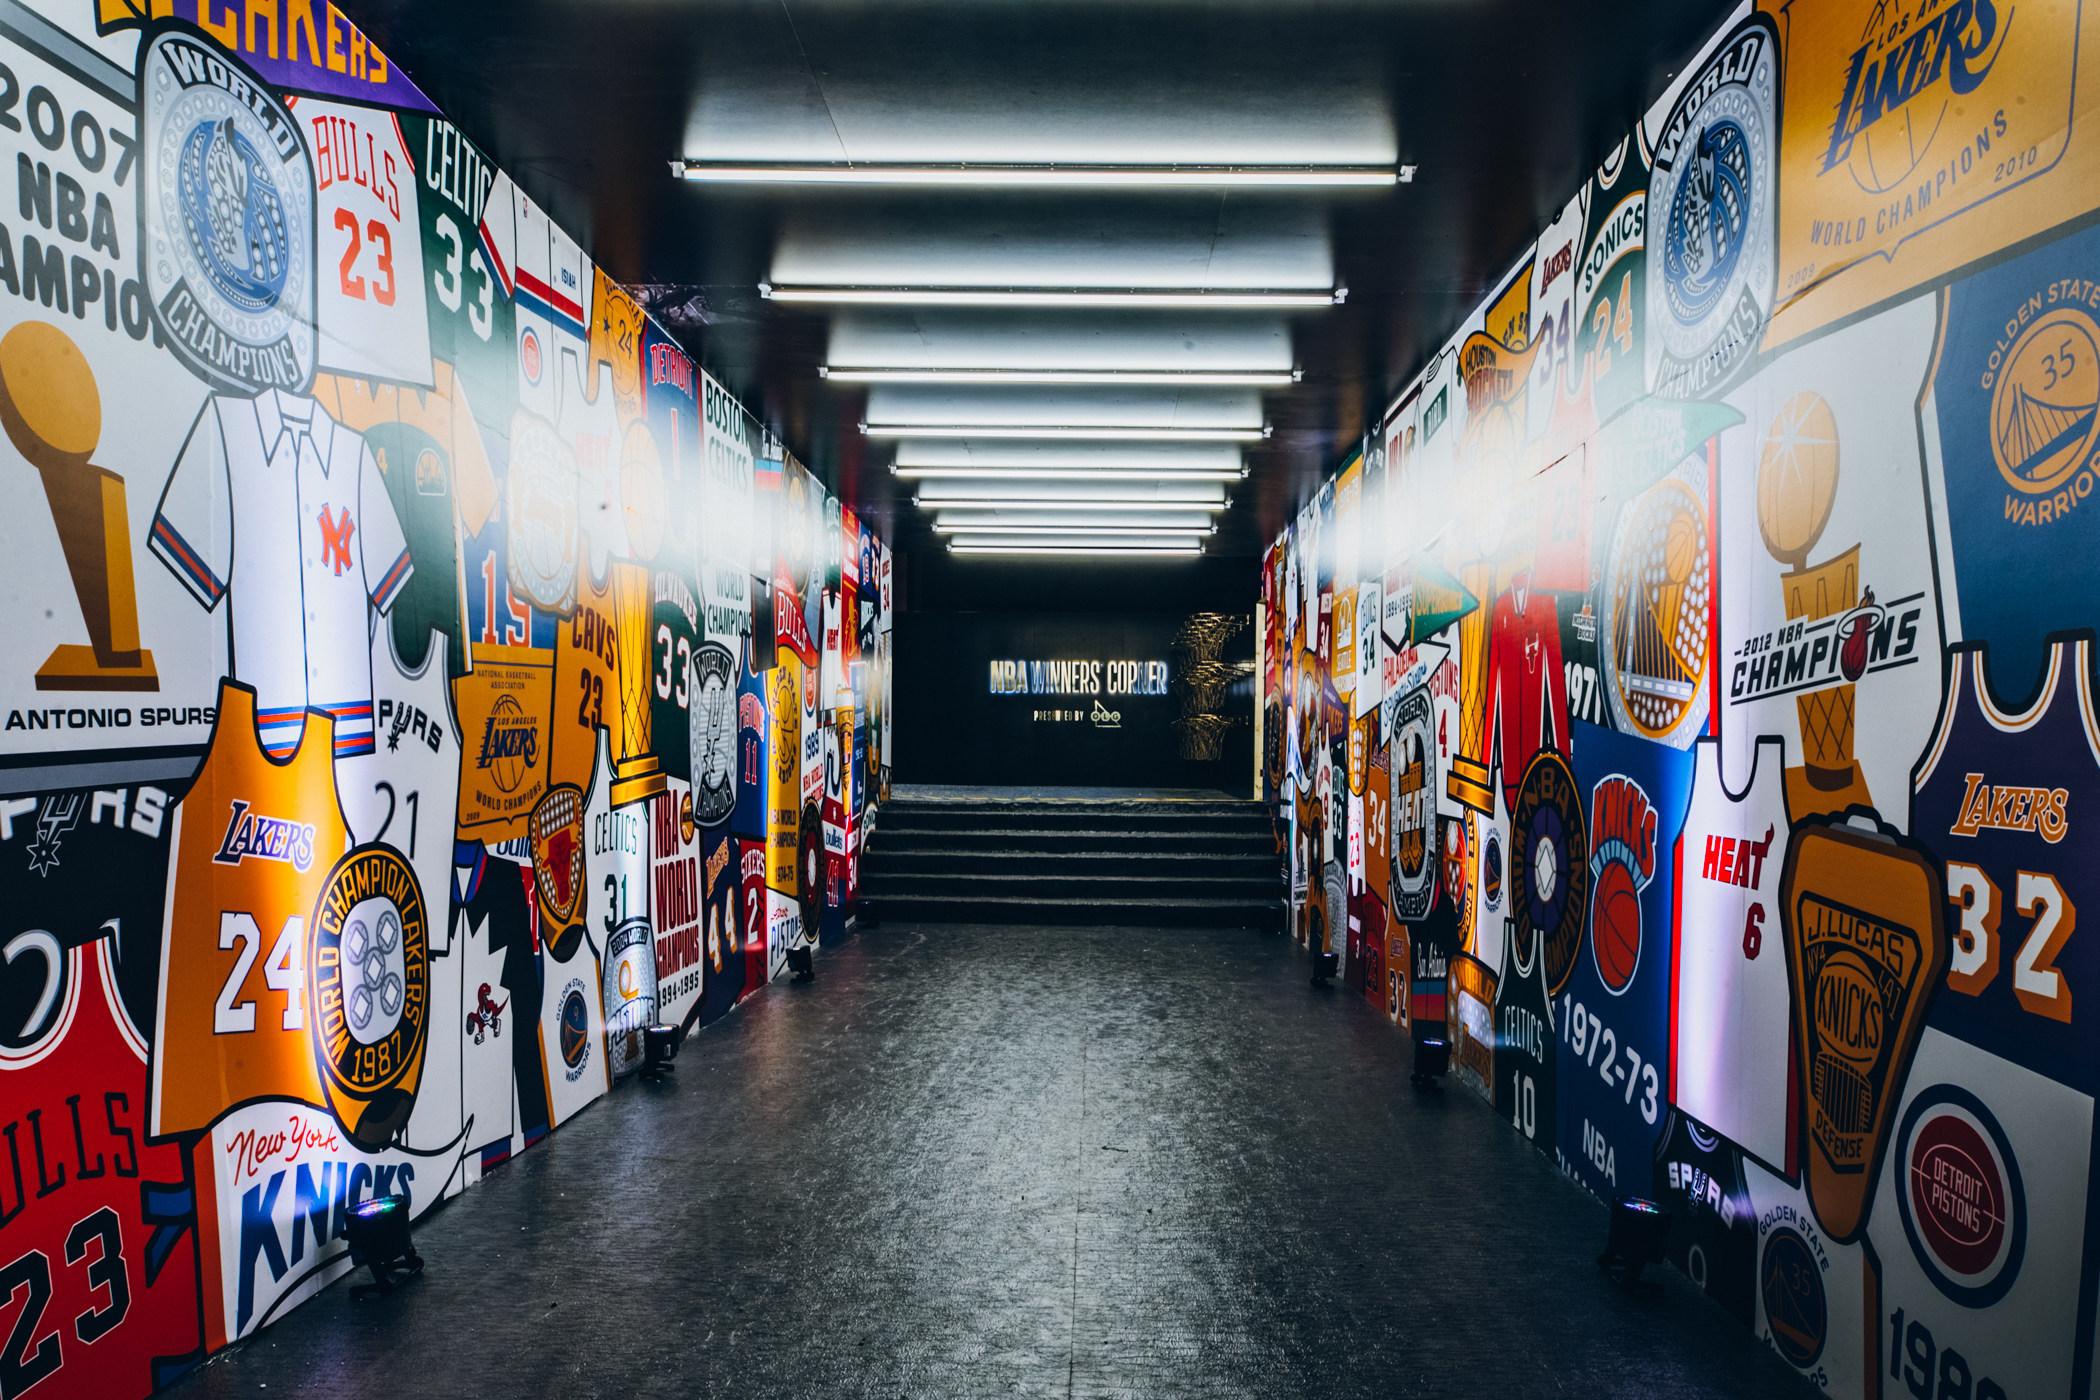 423510ea234 NBA Winners  Corner Presented by OLG to Debut in Toronto Ahead of 2019 NBA  Playoffs